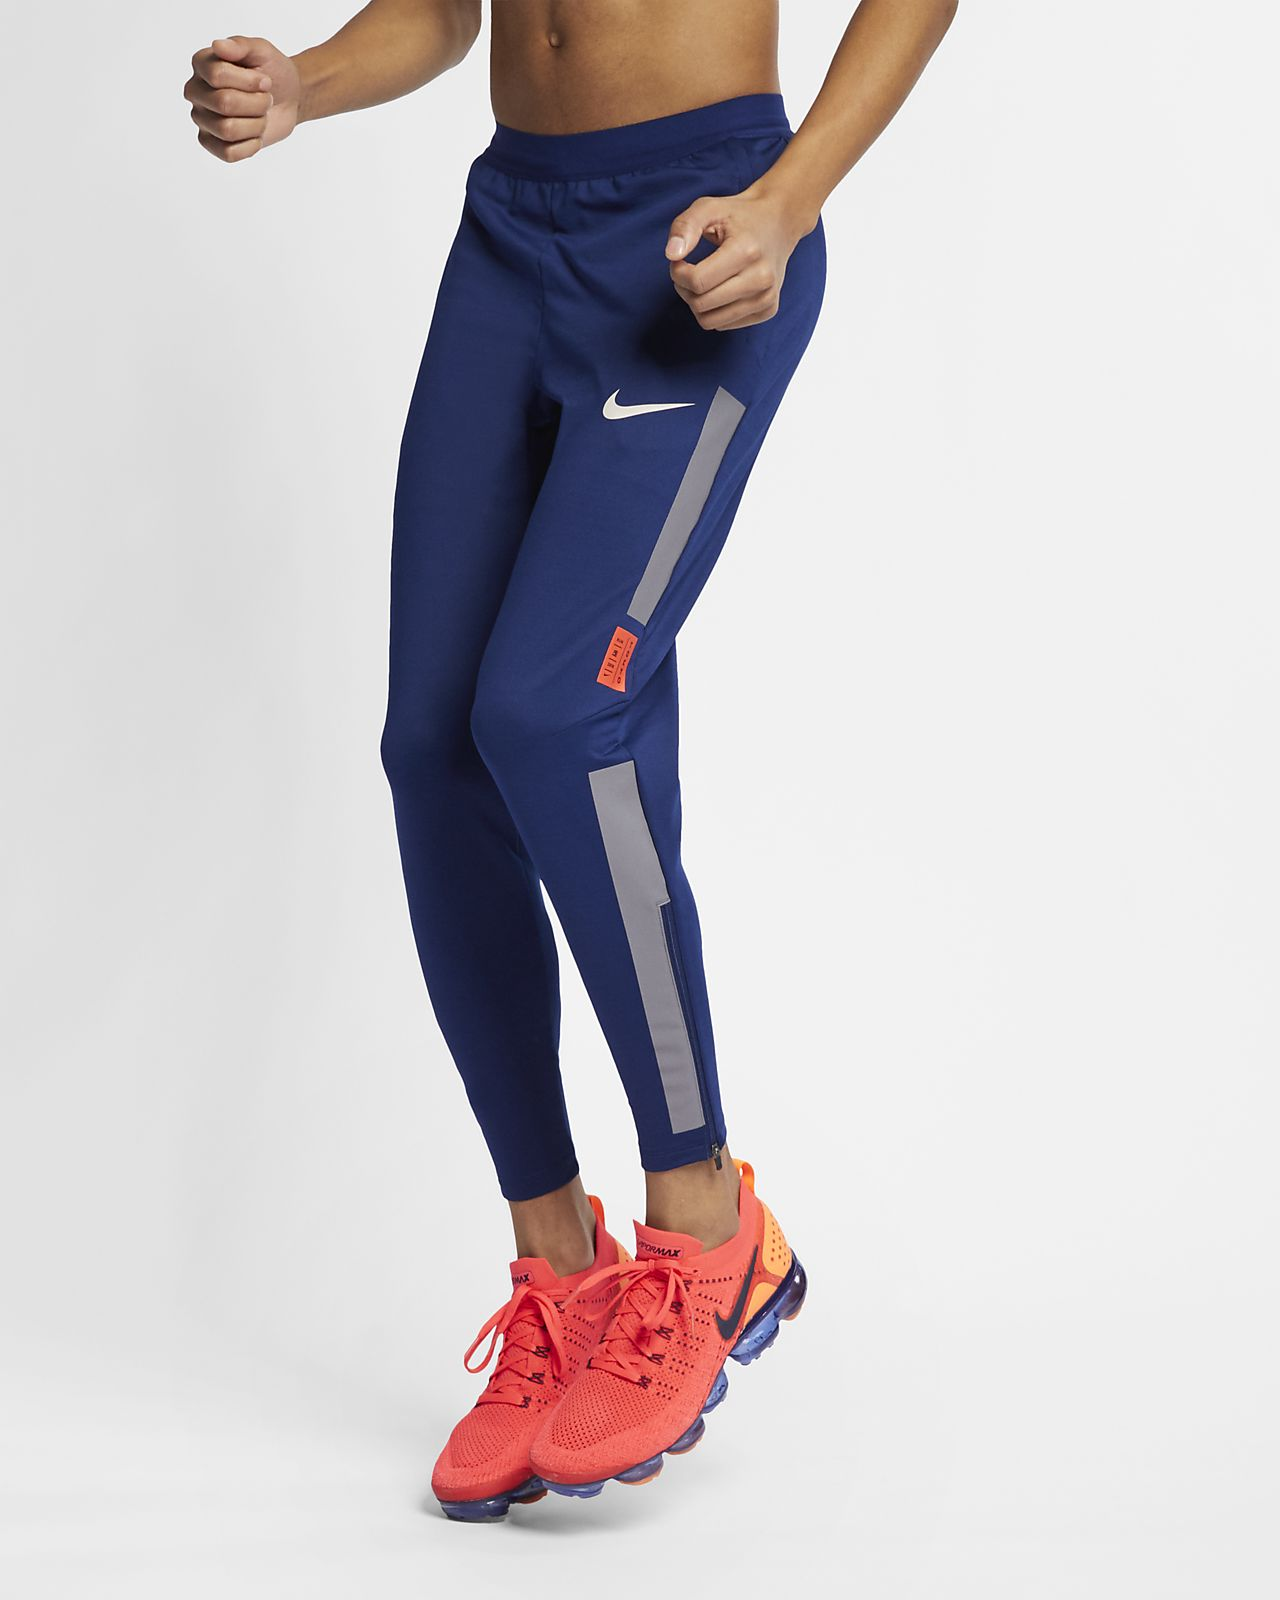 ce7bdde01bfd31 Low Resolution Nike Phenom Hardloopbroek voor heren Nike Phenom  Hardloopbroek voor heren